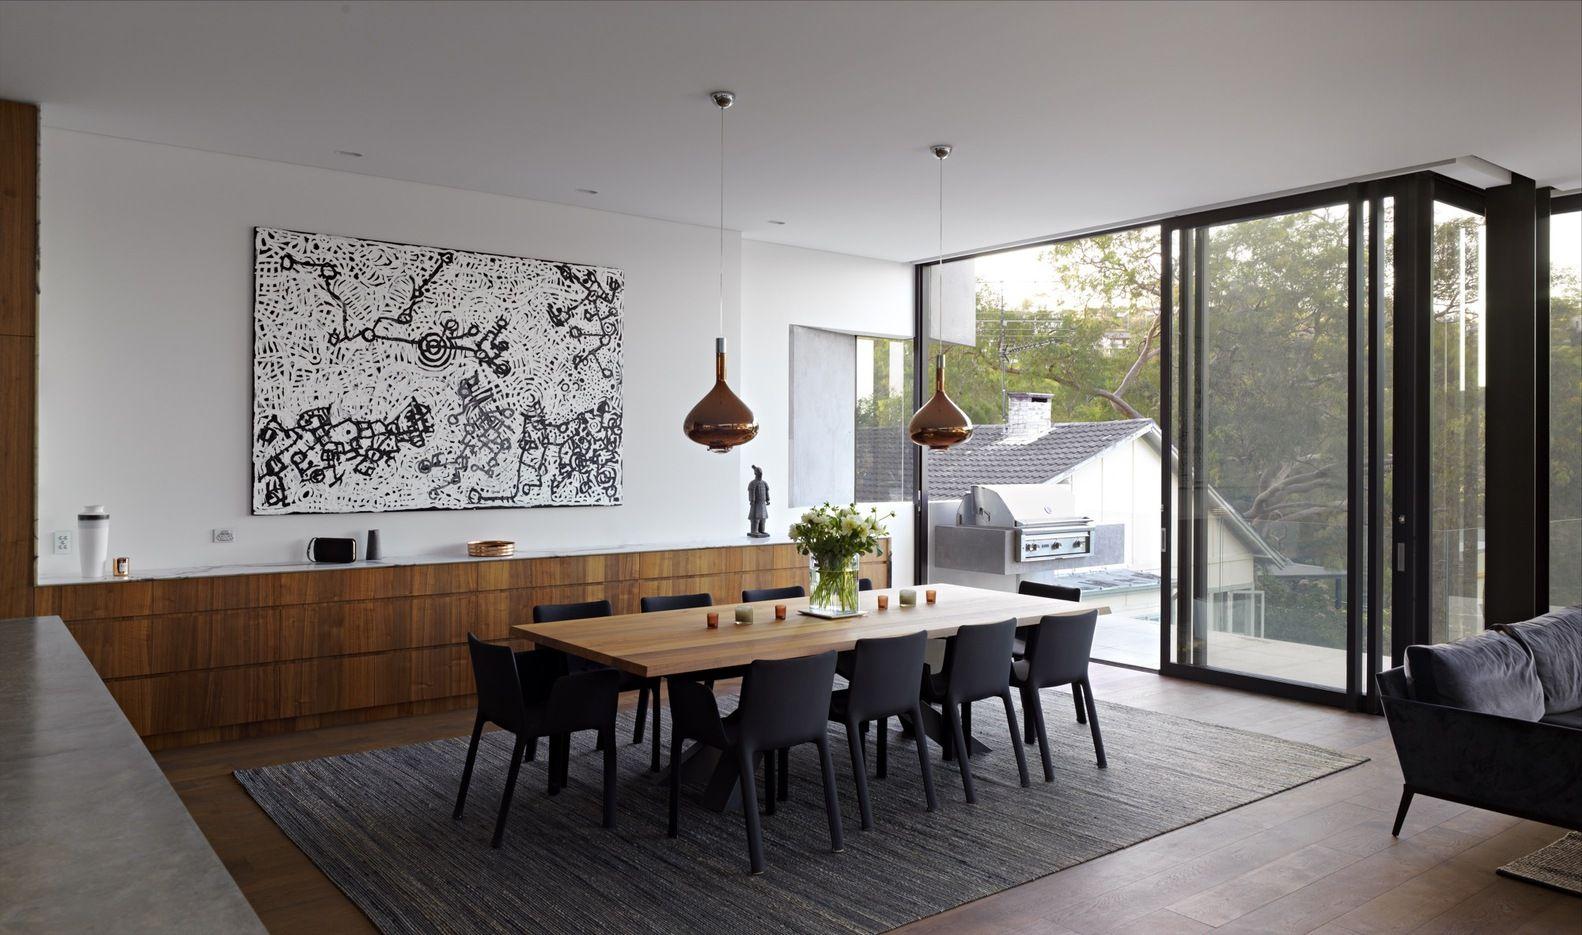 Gallery of Mosman House / Rolf Ockert Design - 7 | House, Space ...